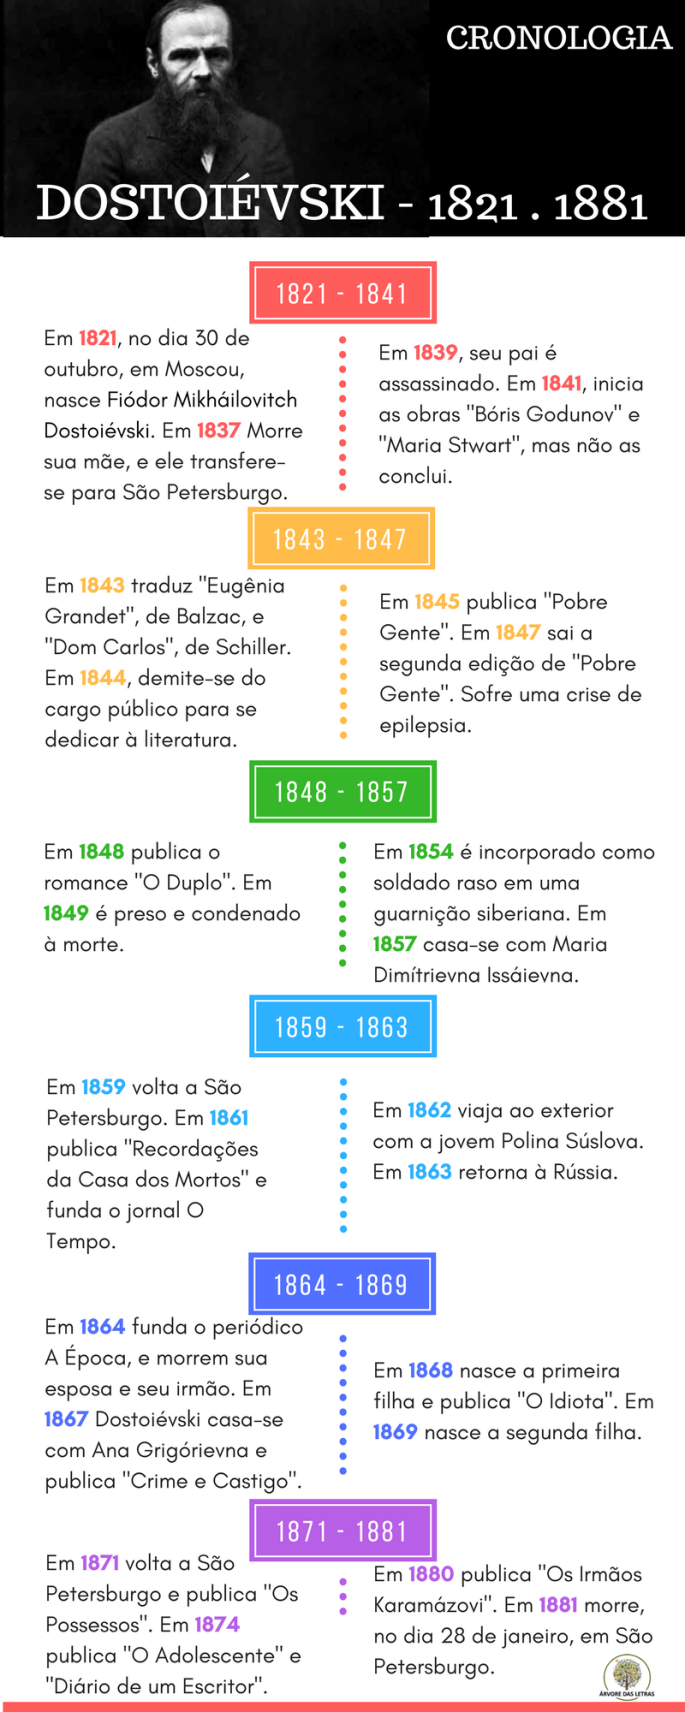 Cronologia - Dostoiévski